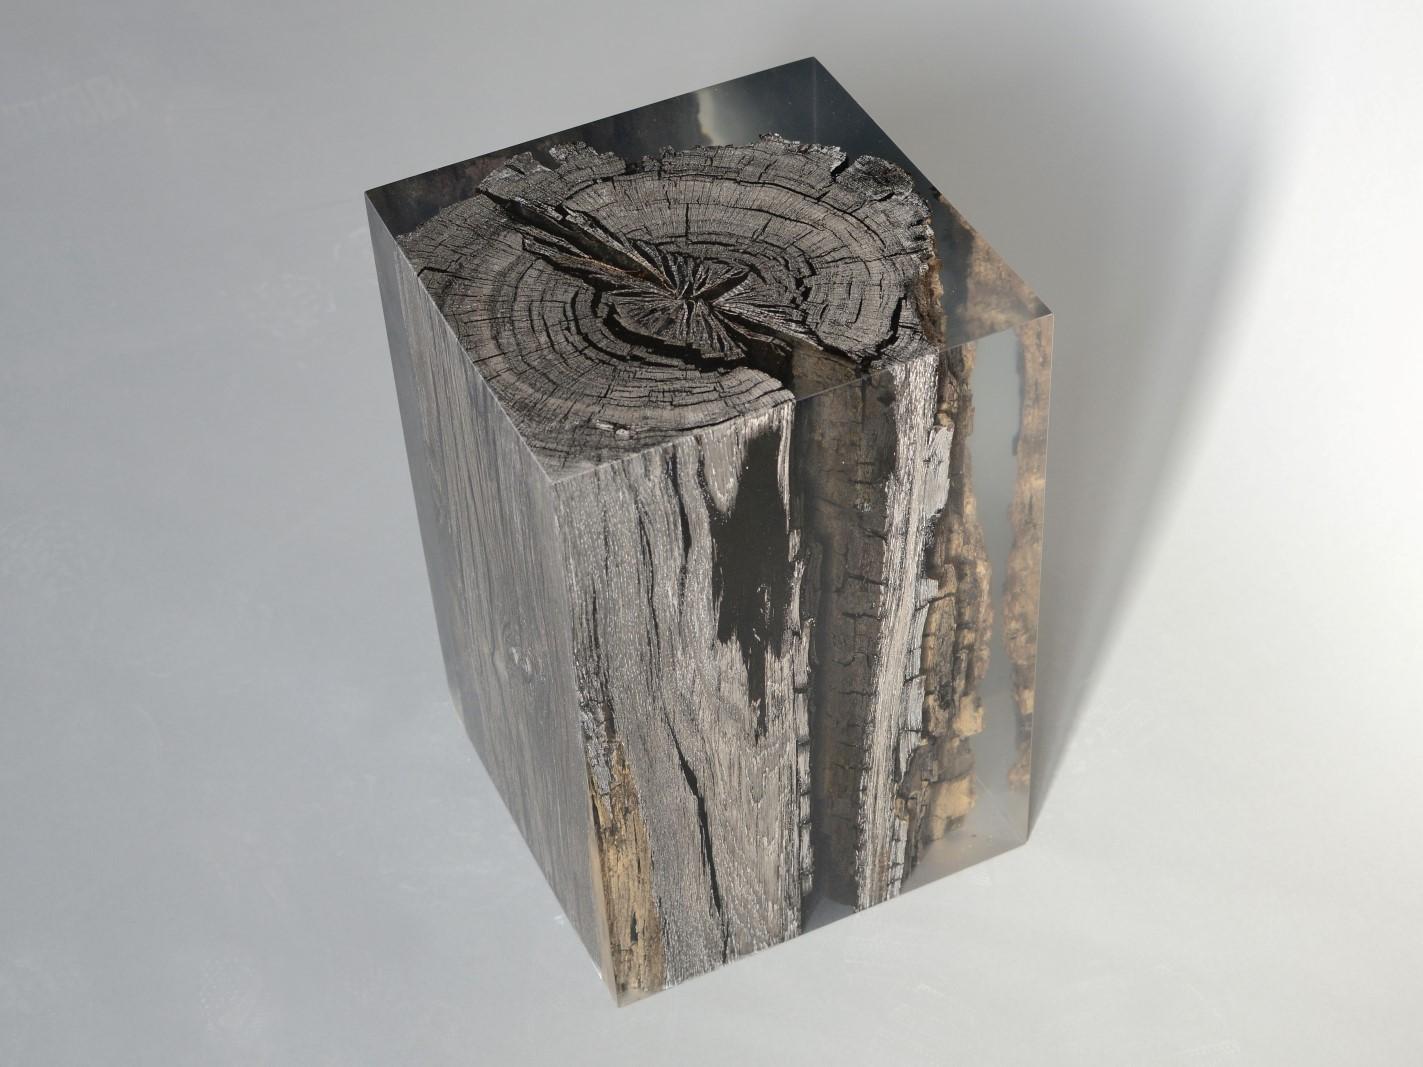 Peatland Black Stool Peatland Collection Alcarol